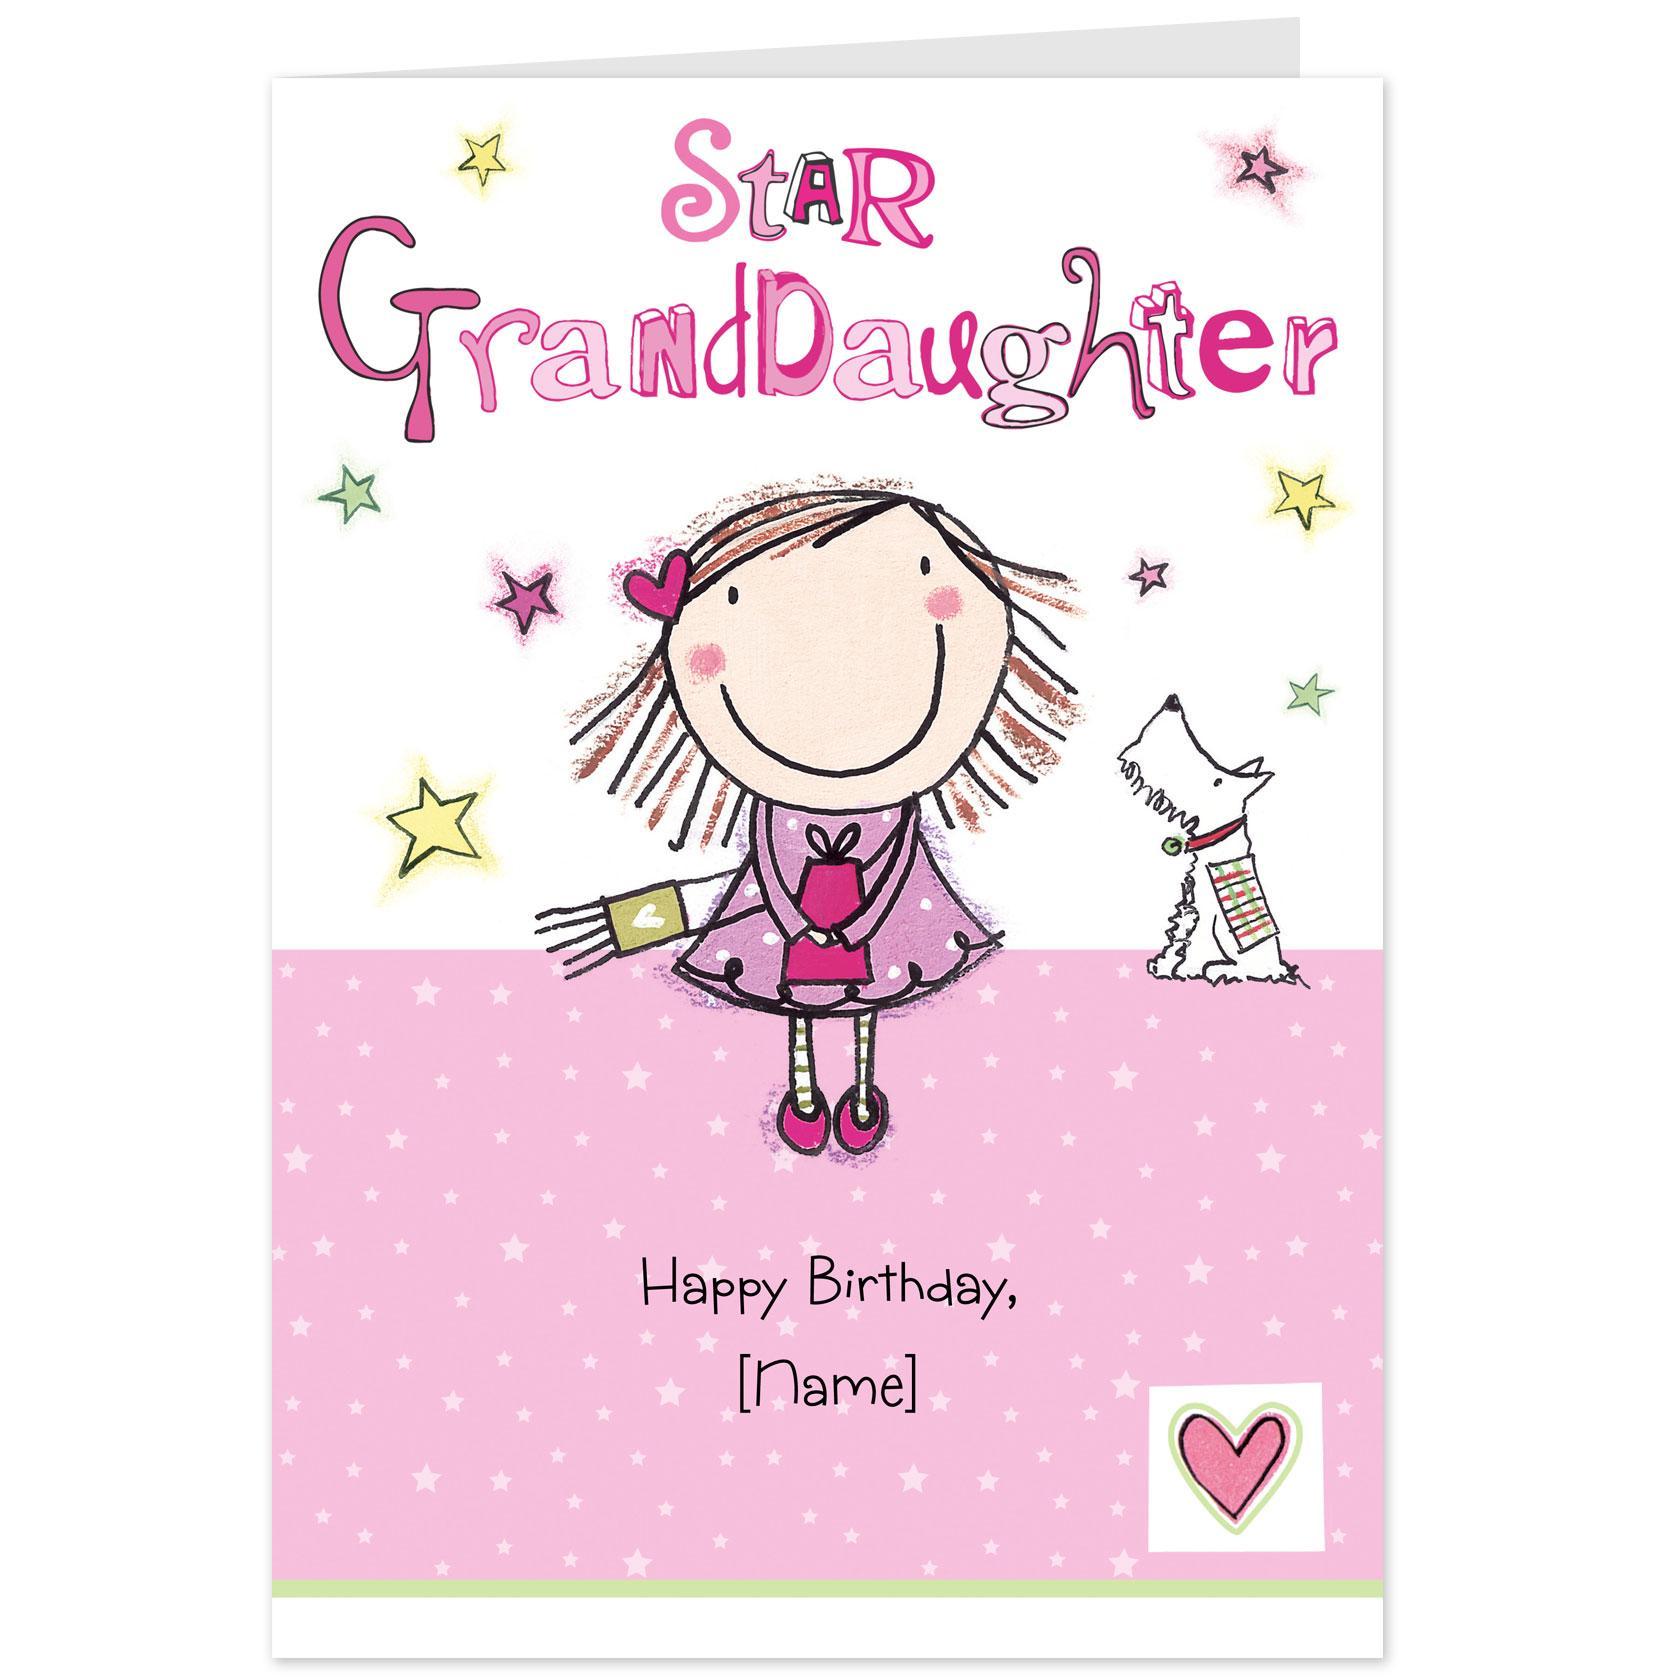 Star Granddaughter Happy Birthday  Picsmine